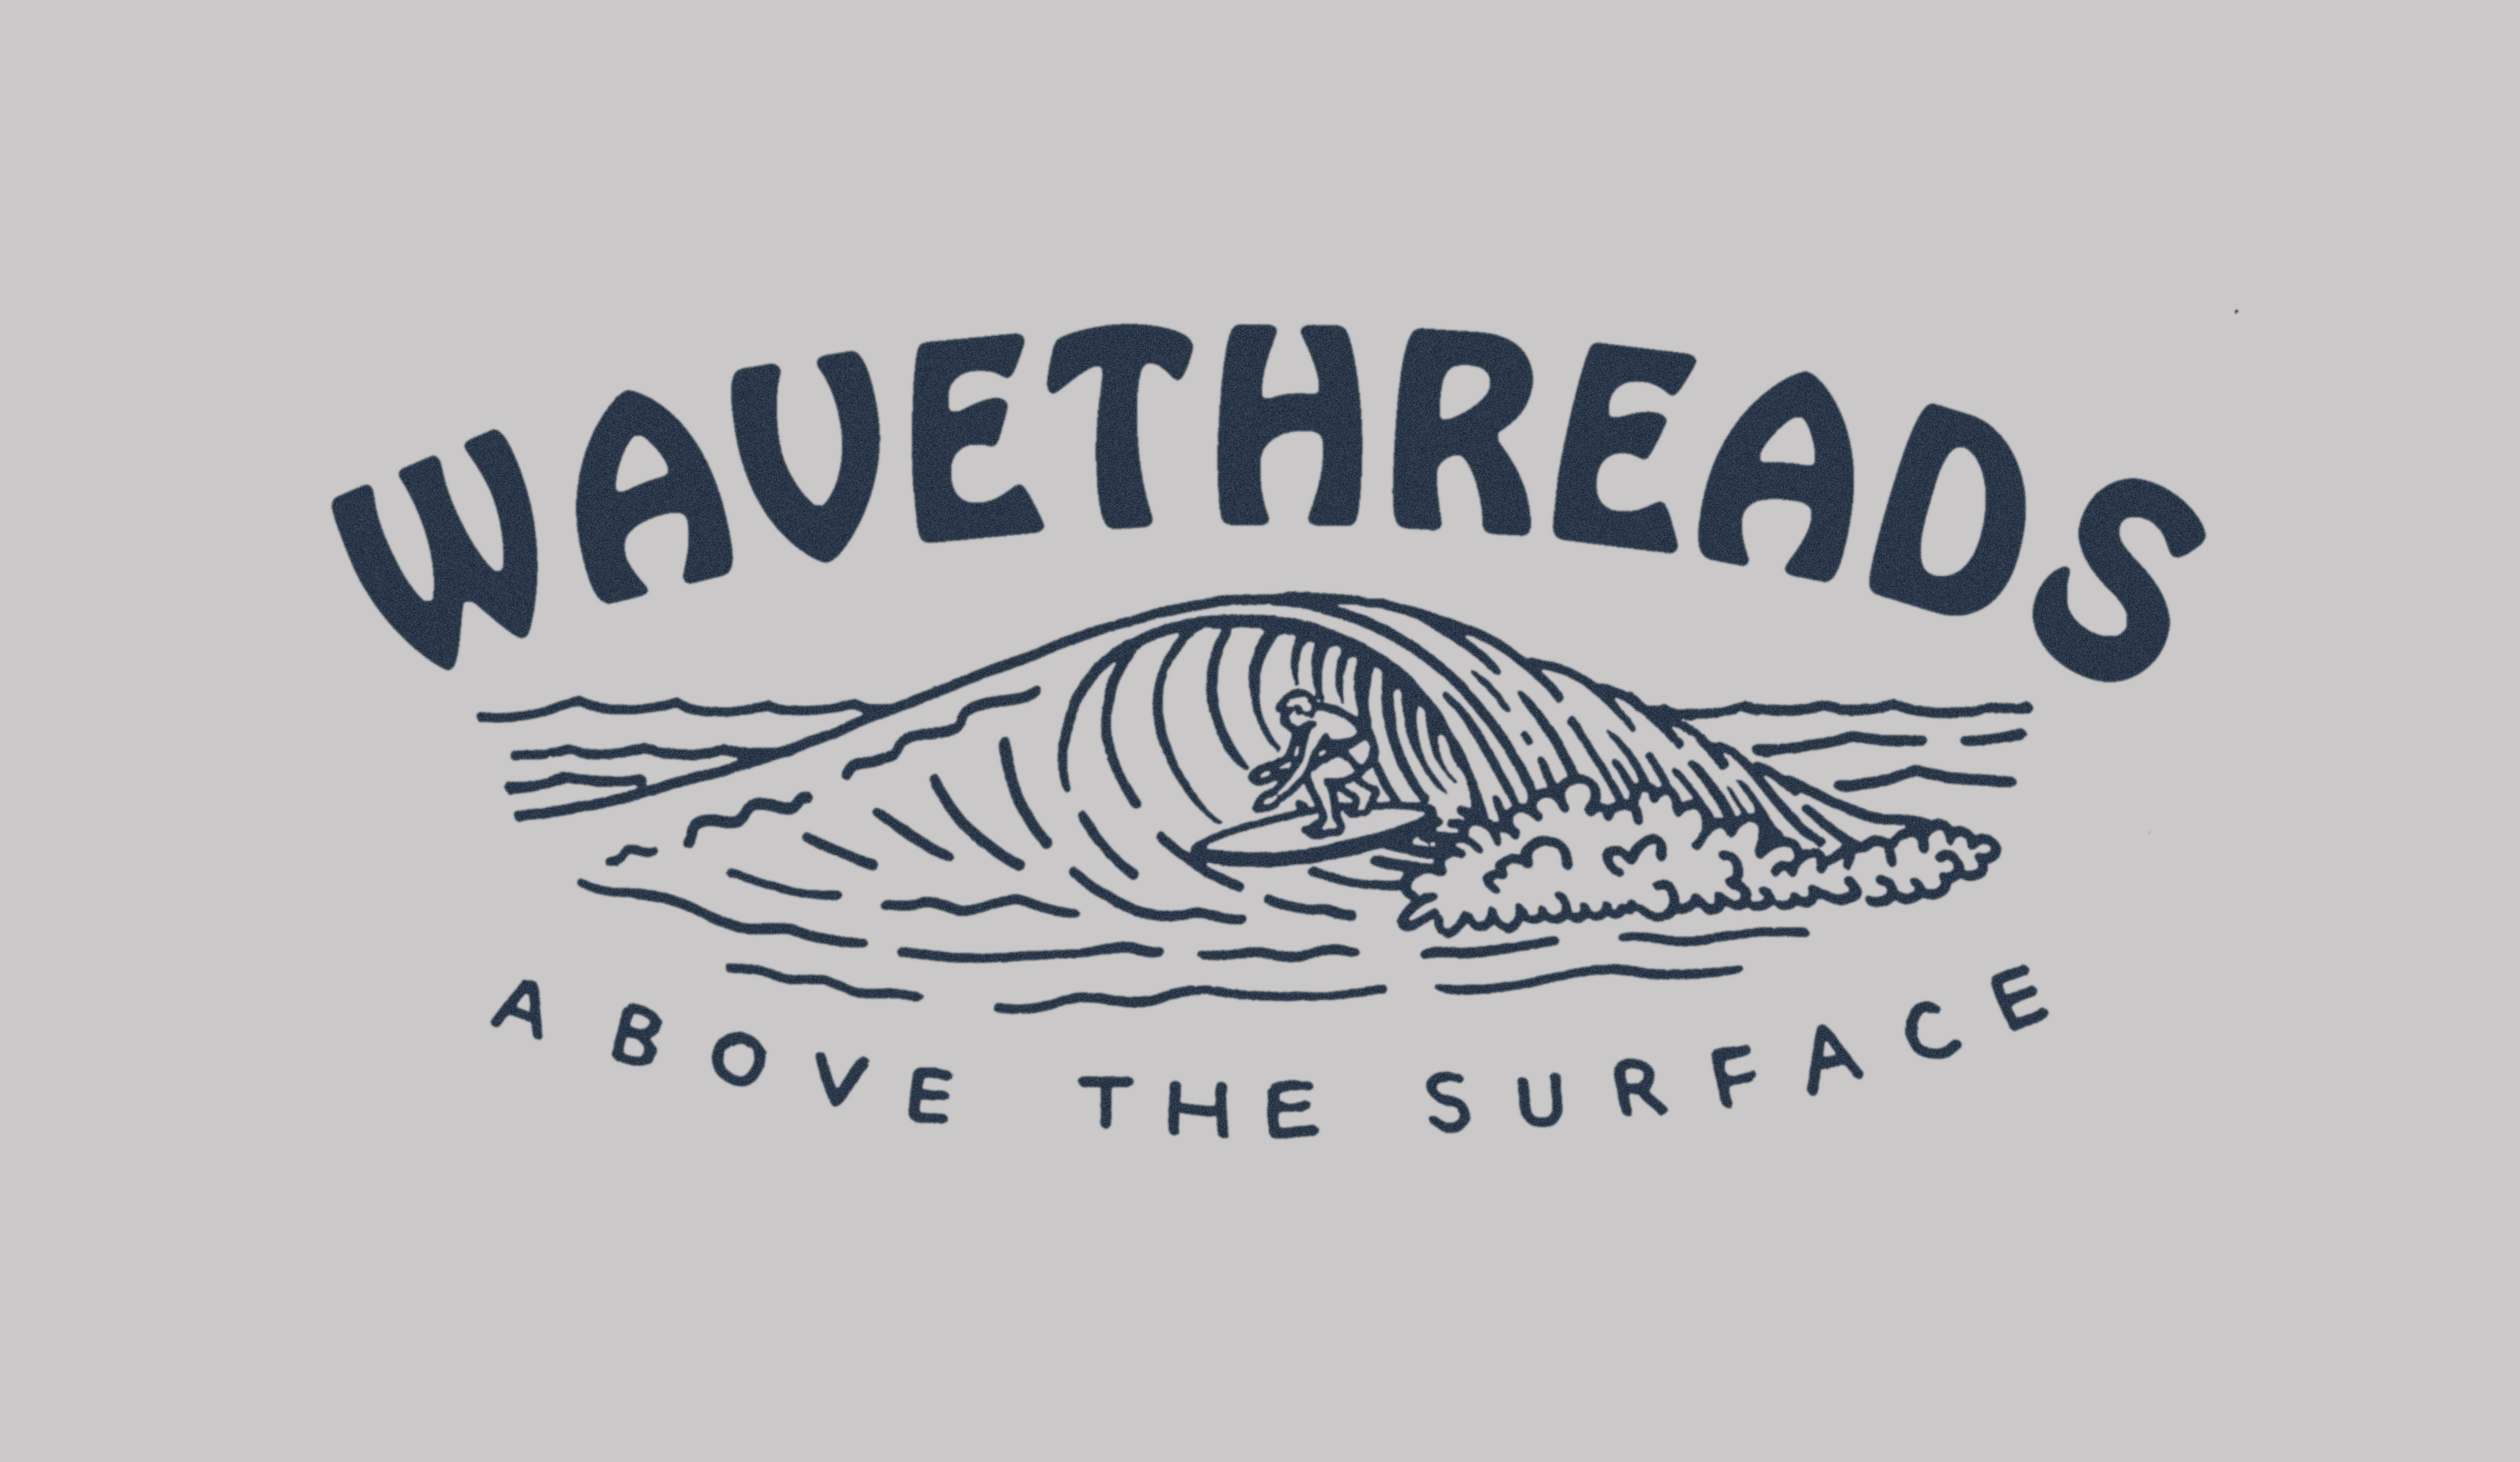 Wavethreads